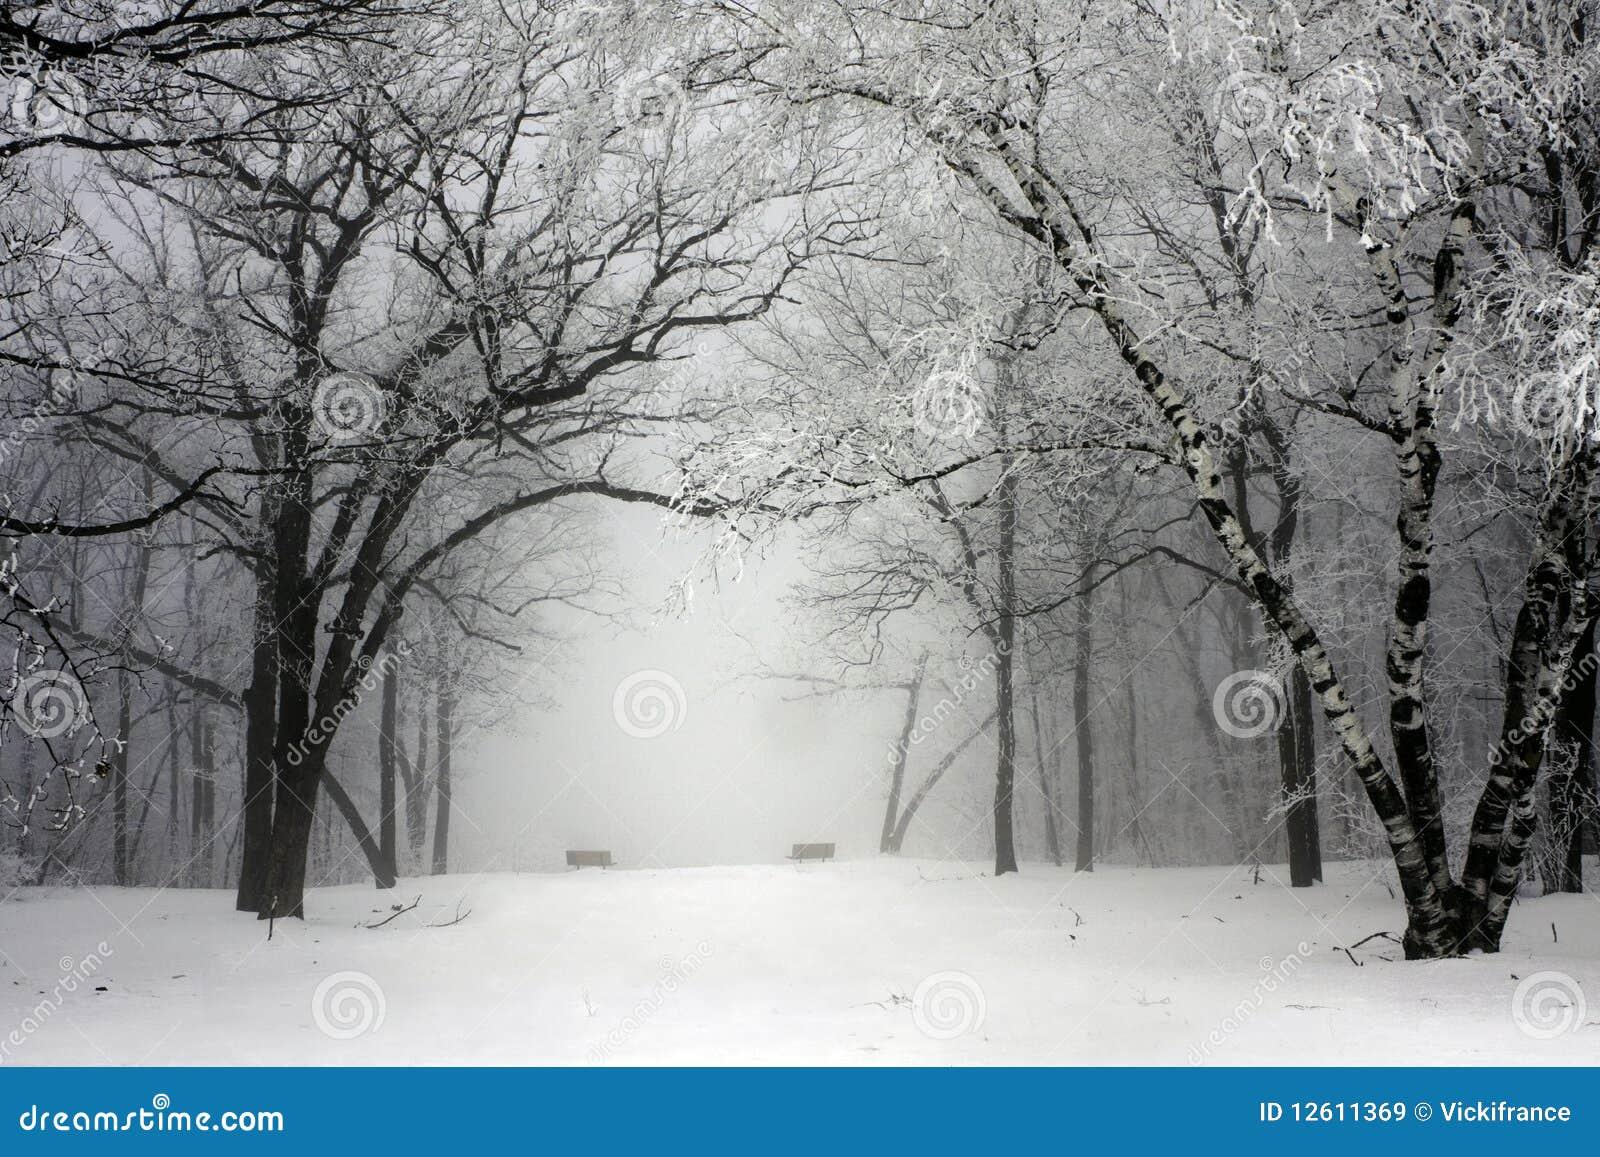 Foggy winter park